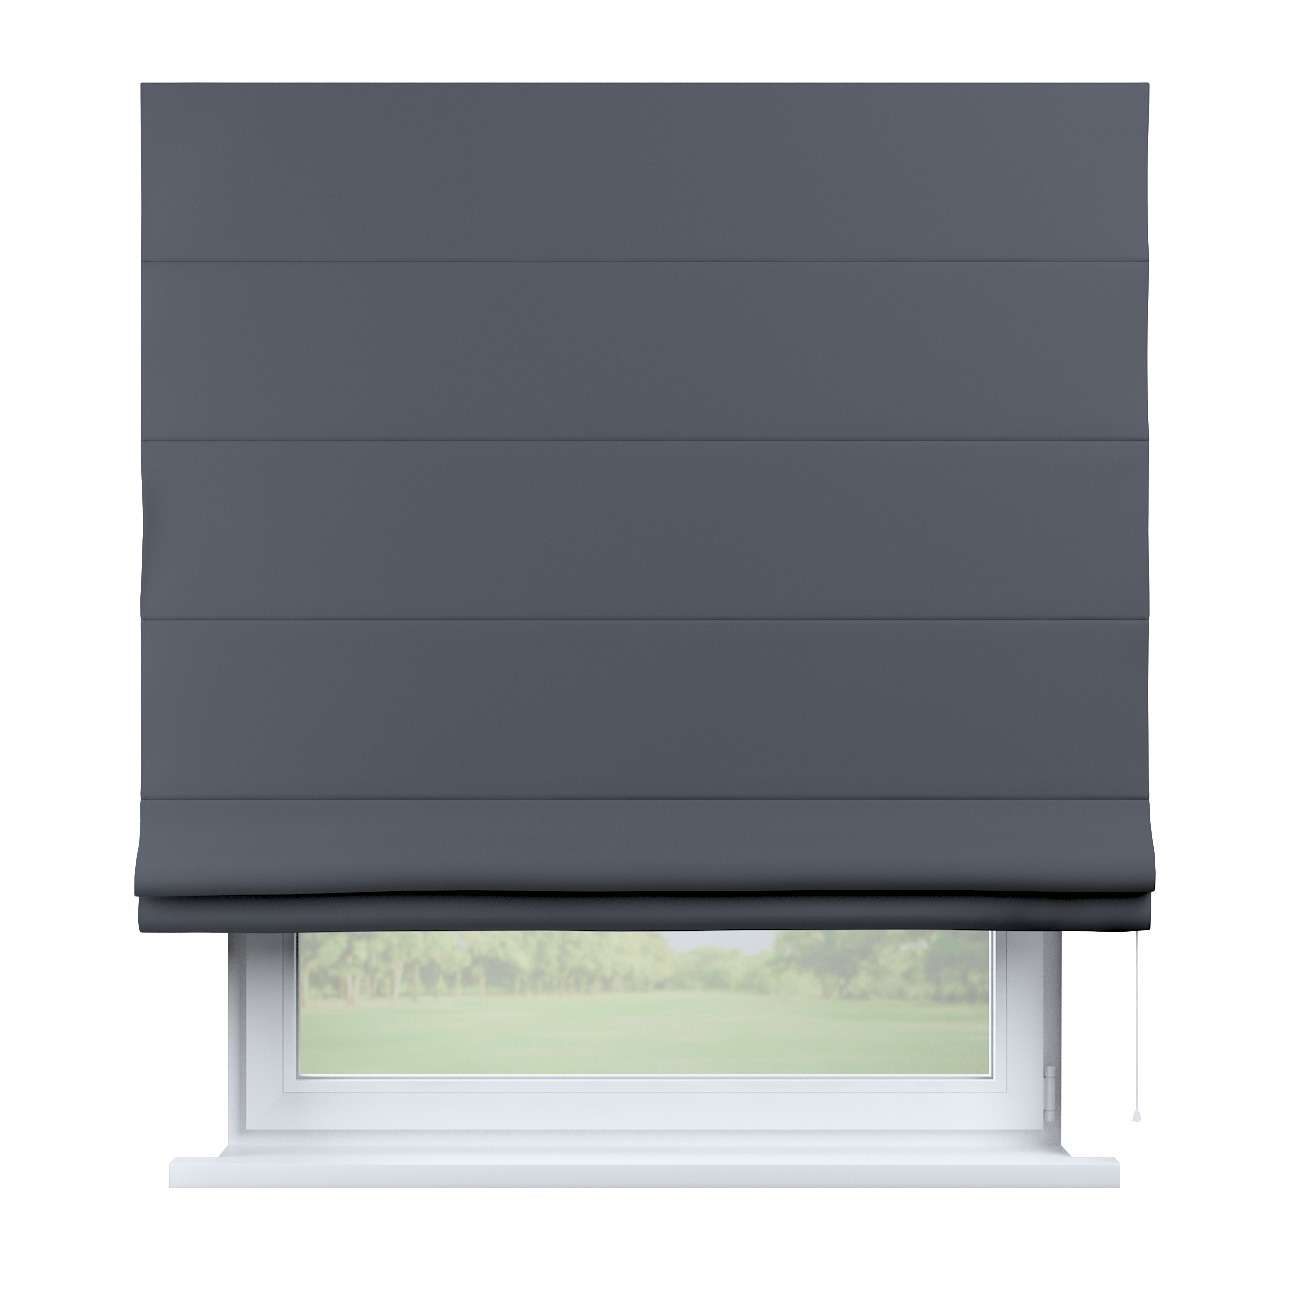 roleta rzymska zaciemniaj ca ciemno szary x d. Black Bedroom Furniture Sets. Home Design Ideas